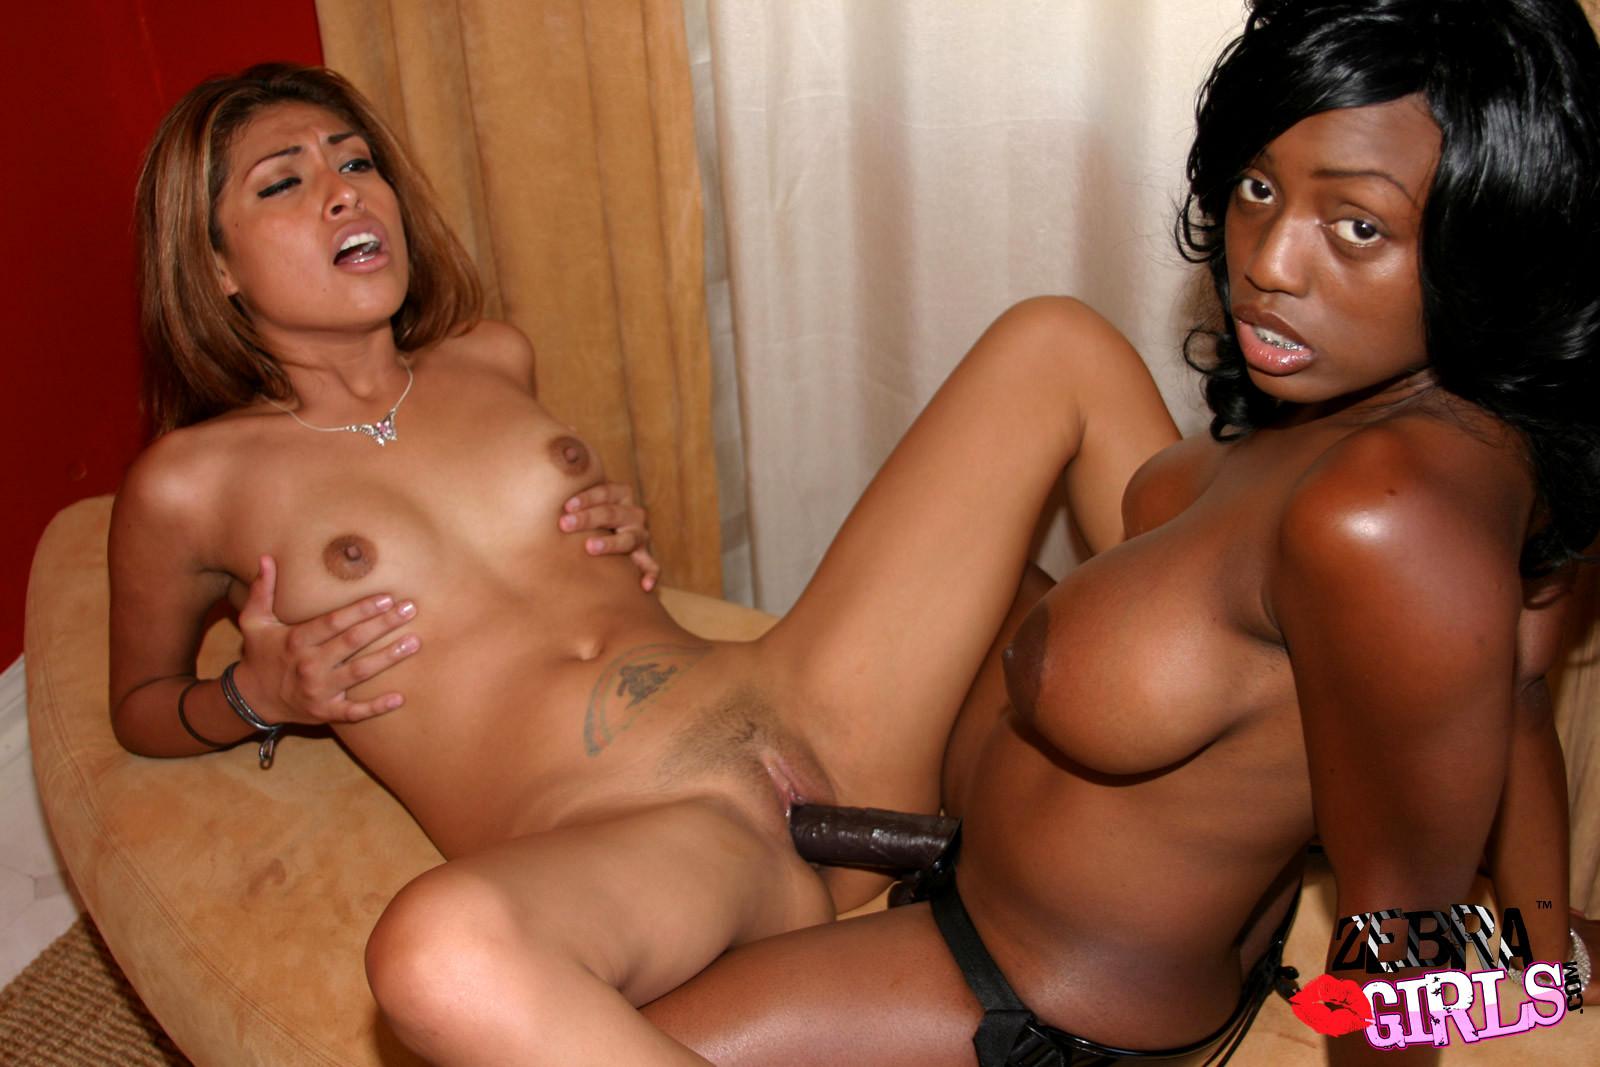 Babe Today Zebra Girls Jada Fire Hq Lesbian Vip Tube Porn Pics-3651